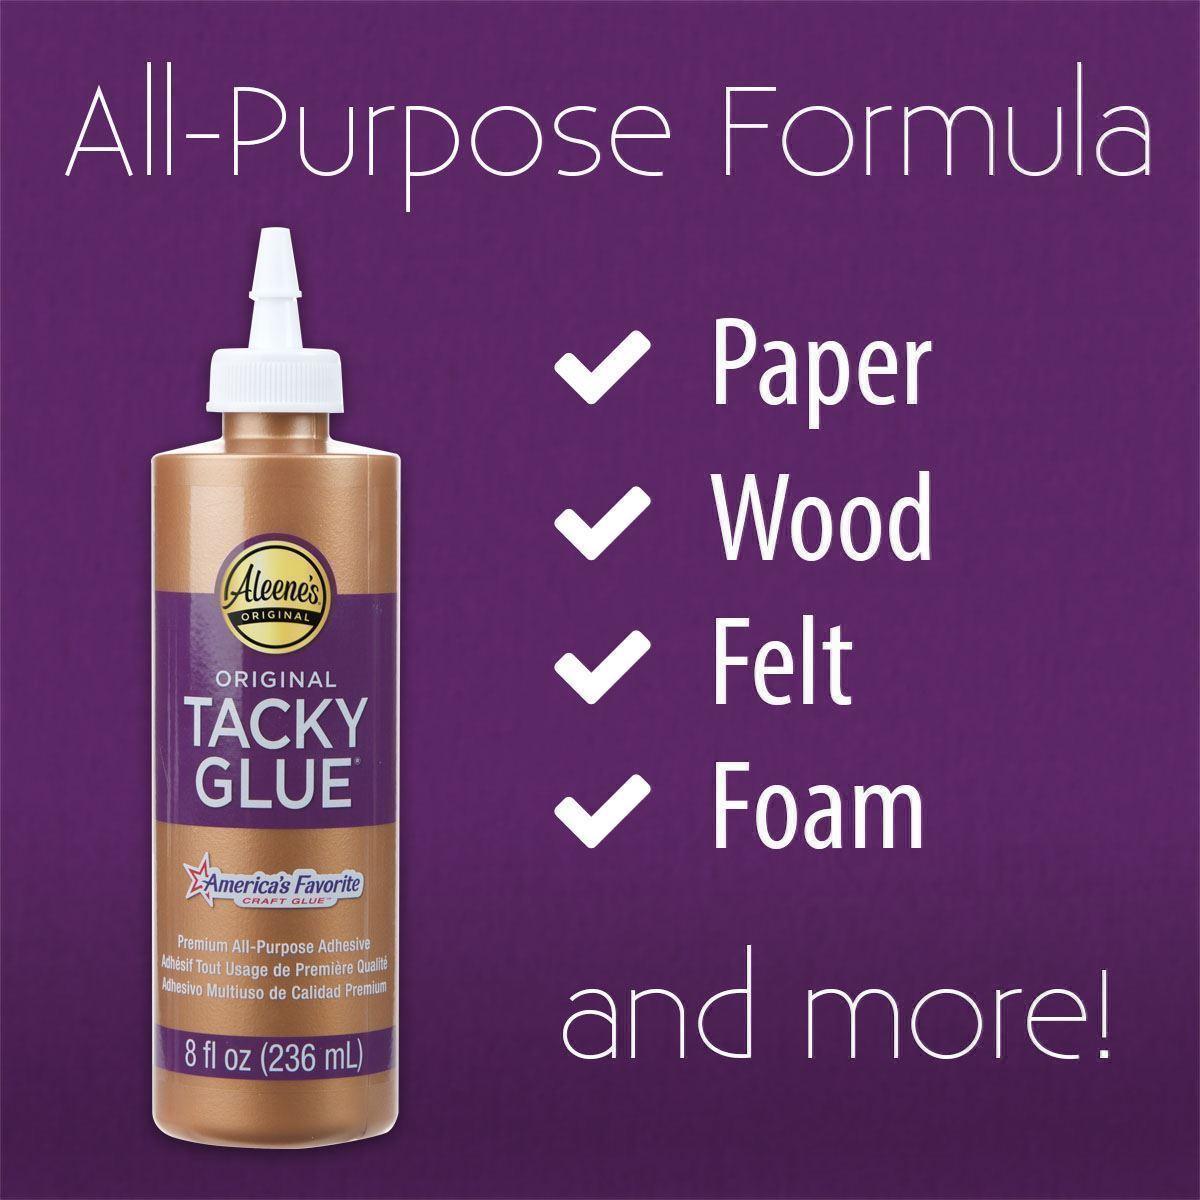 Aleene's® Original Tacky Glue®  All-Purpose Formula, best on paper, wood, felt, foam and more